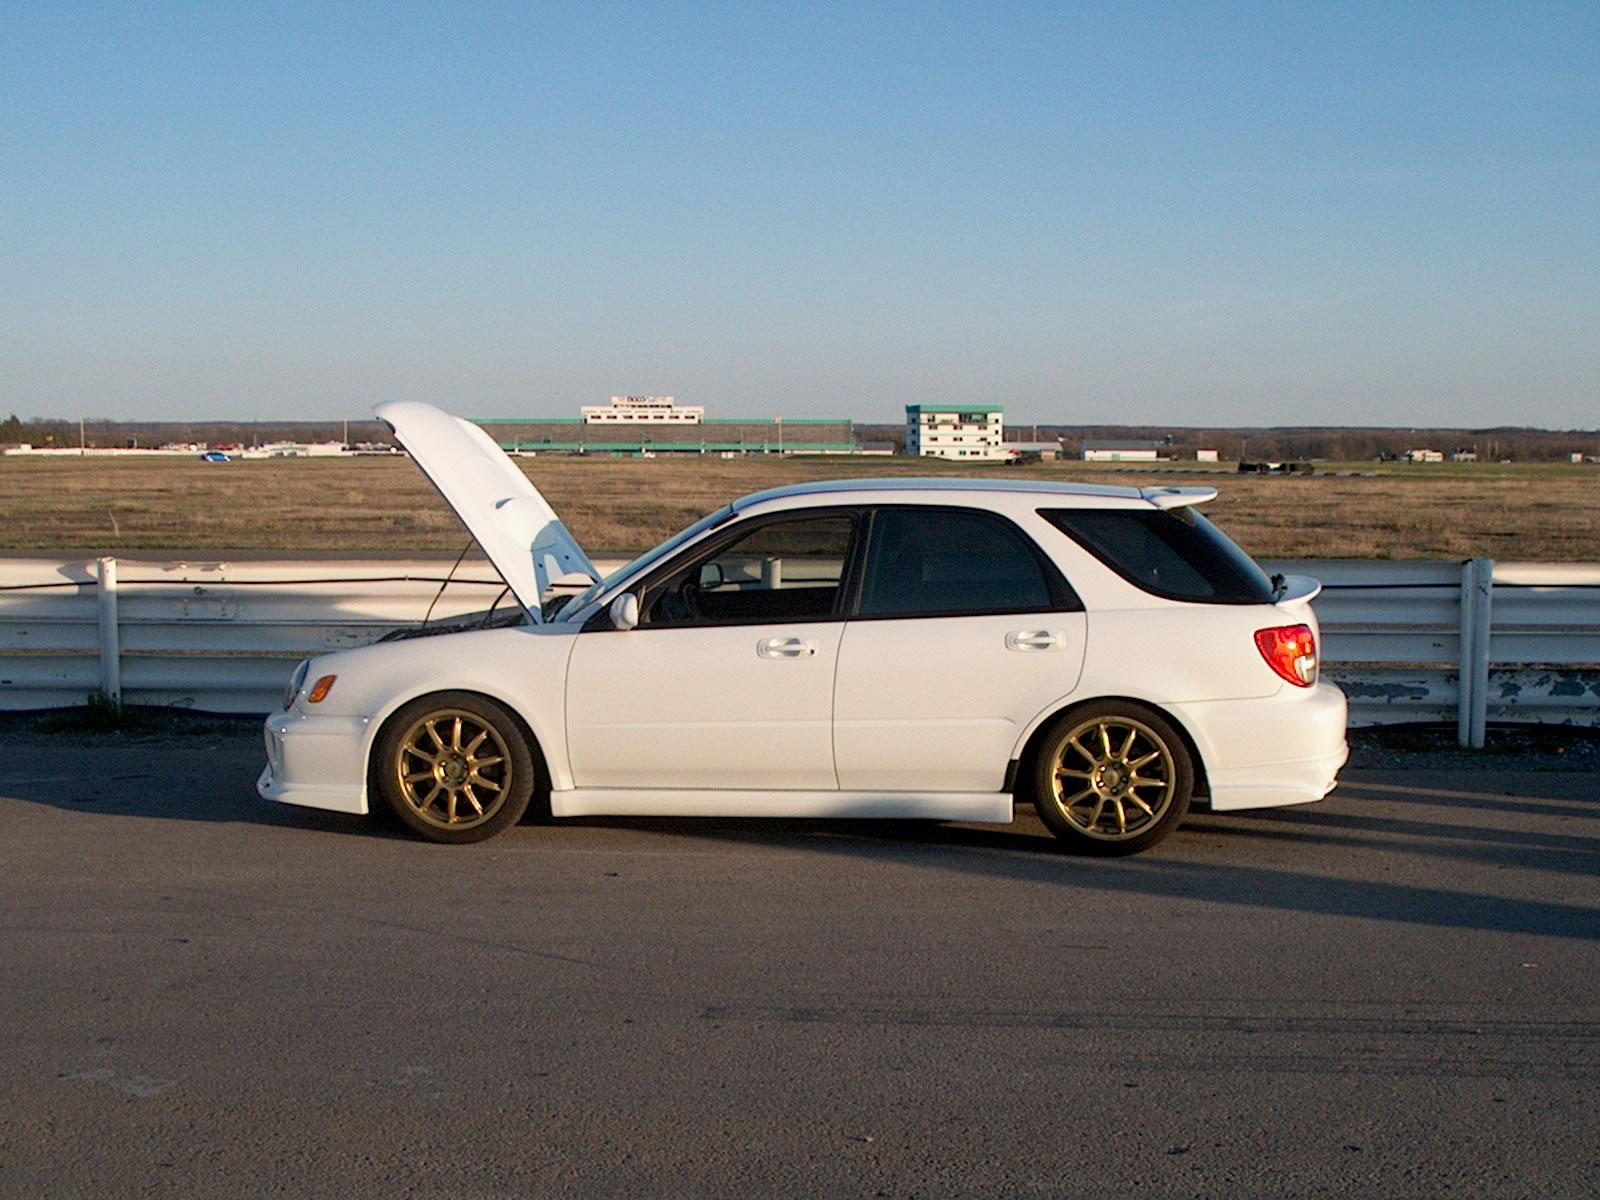 2003 subaru impreza 2 0 wrx sports wagon related infomation specifications weili automotive. Black Bedroom Furniture Sets. Home Design Ideas